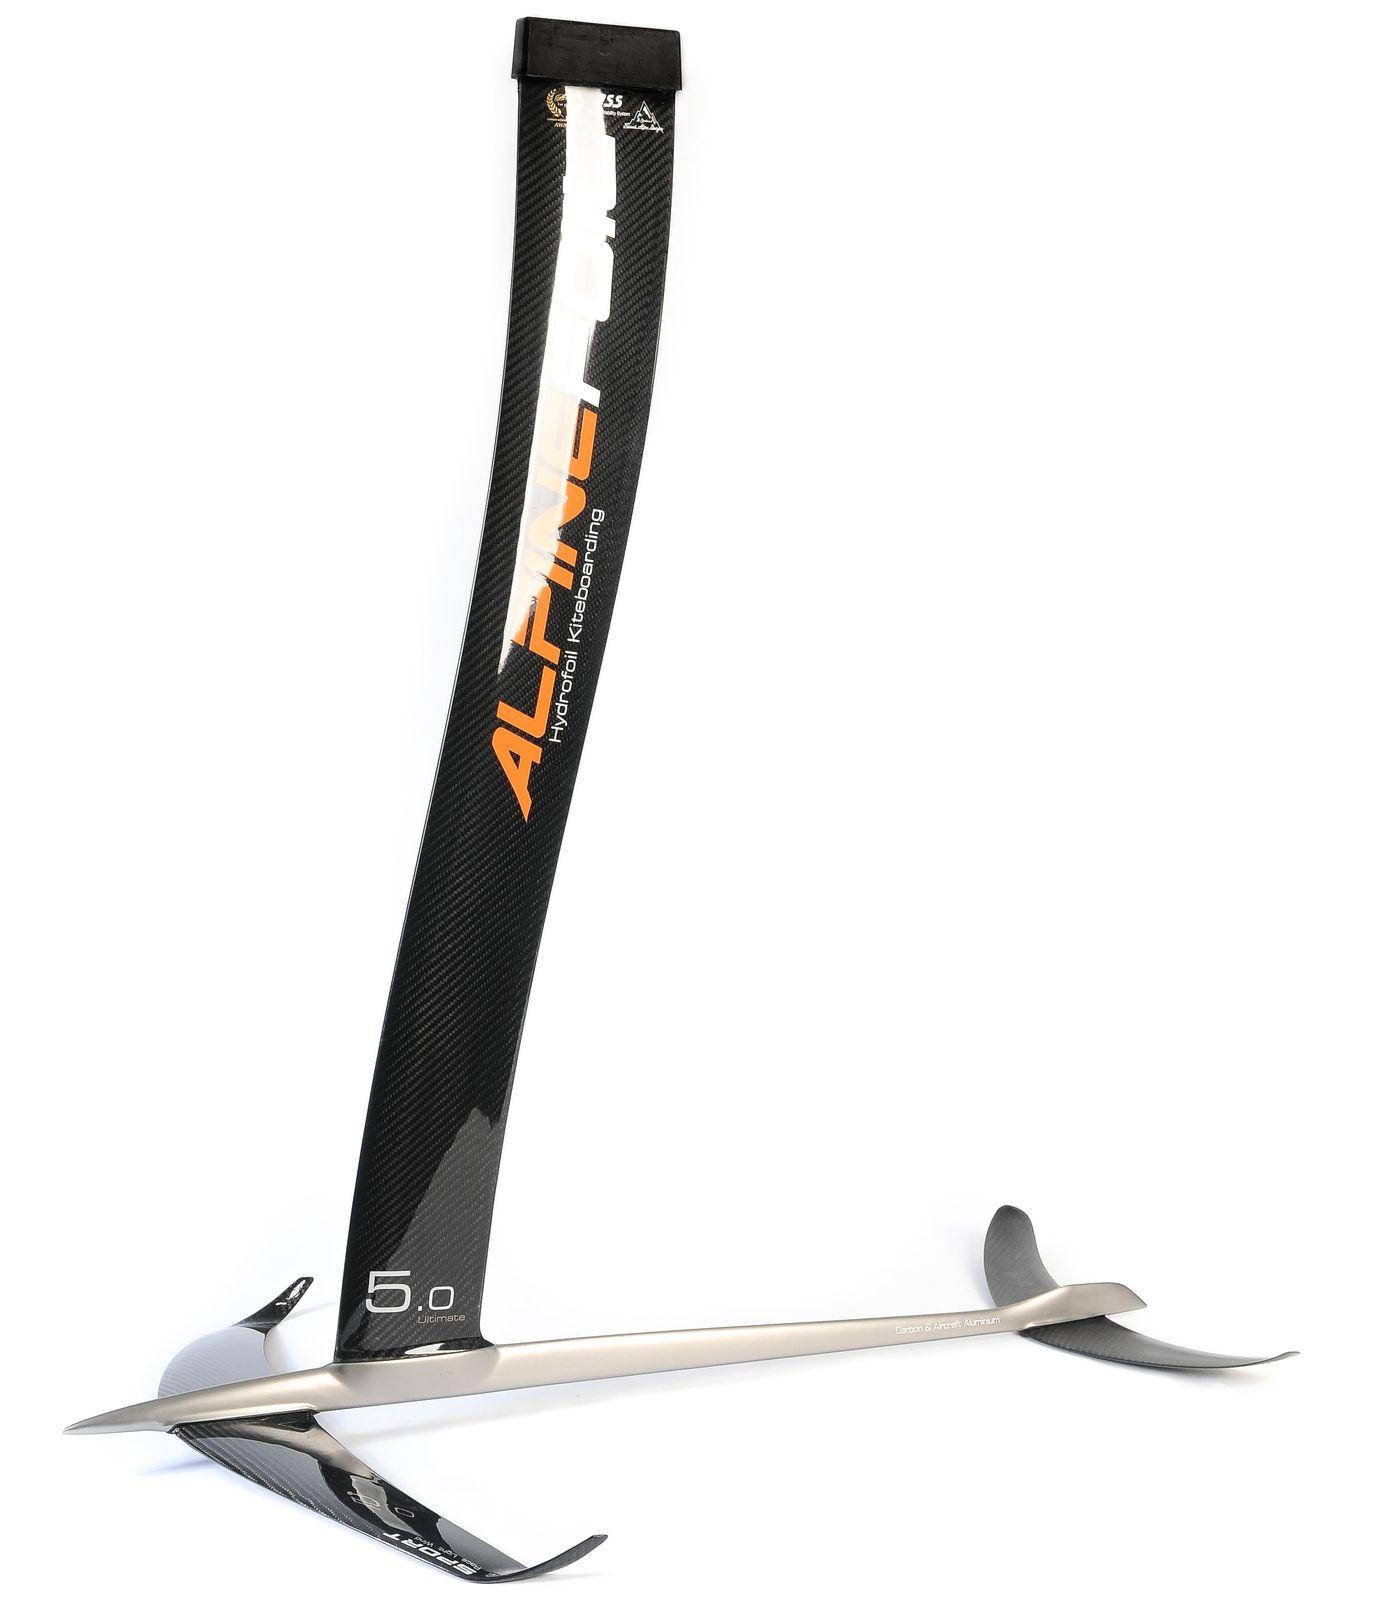 Kitefoil alpinefoil carbon aluminium gis ultimate 9 resultat